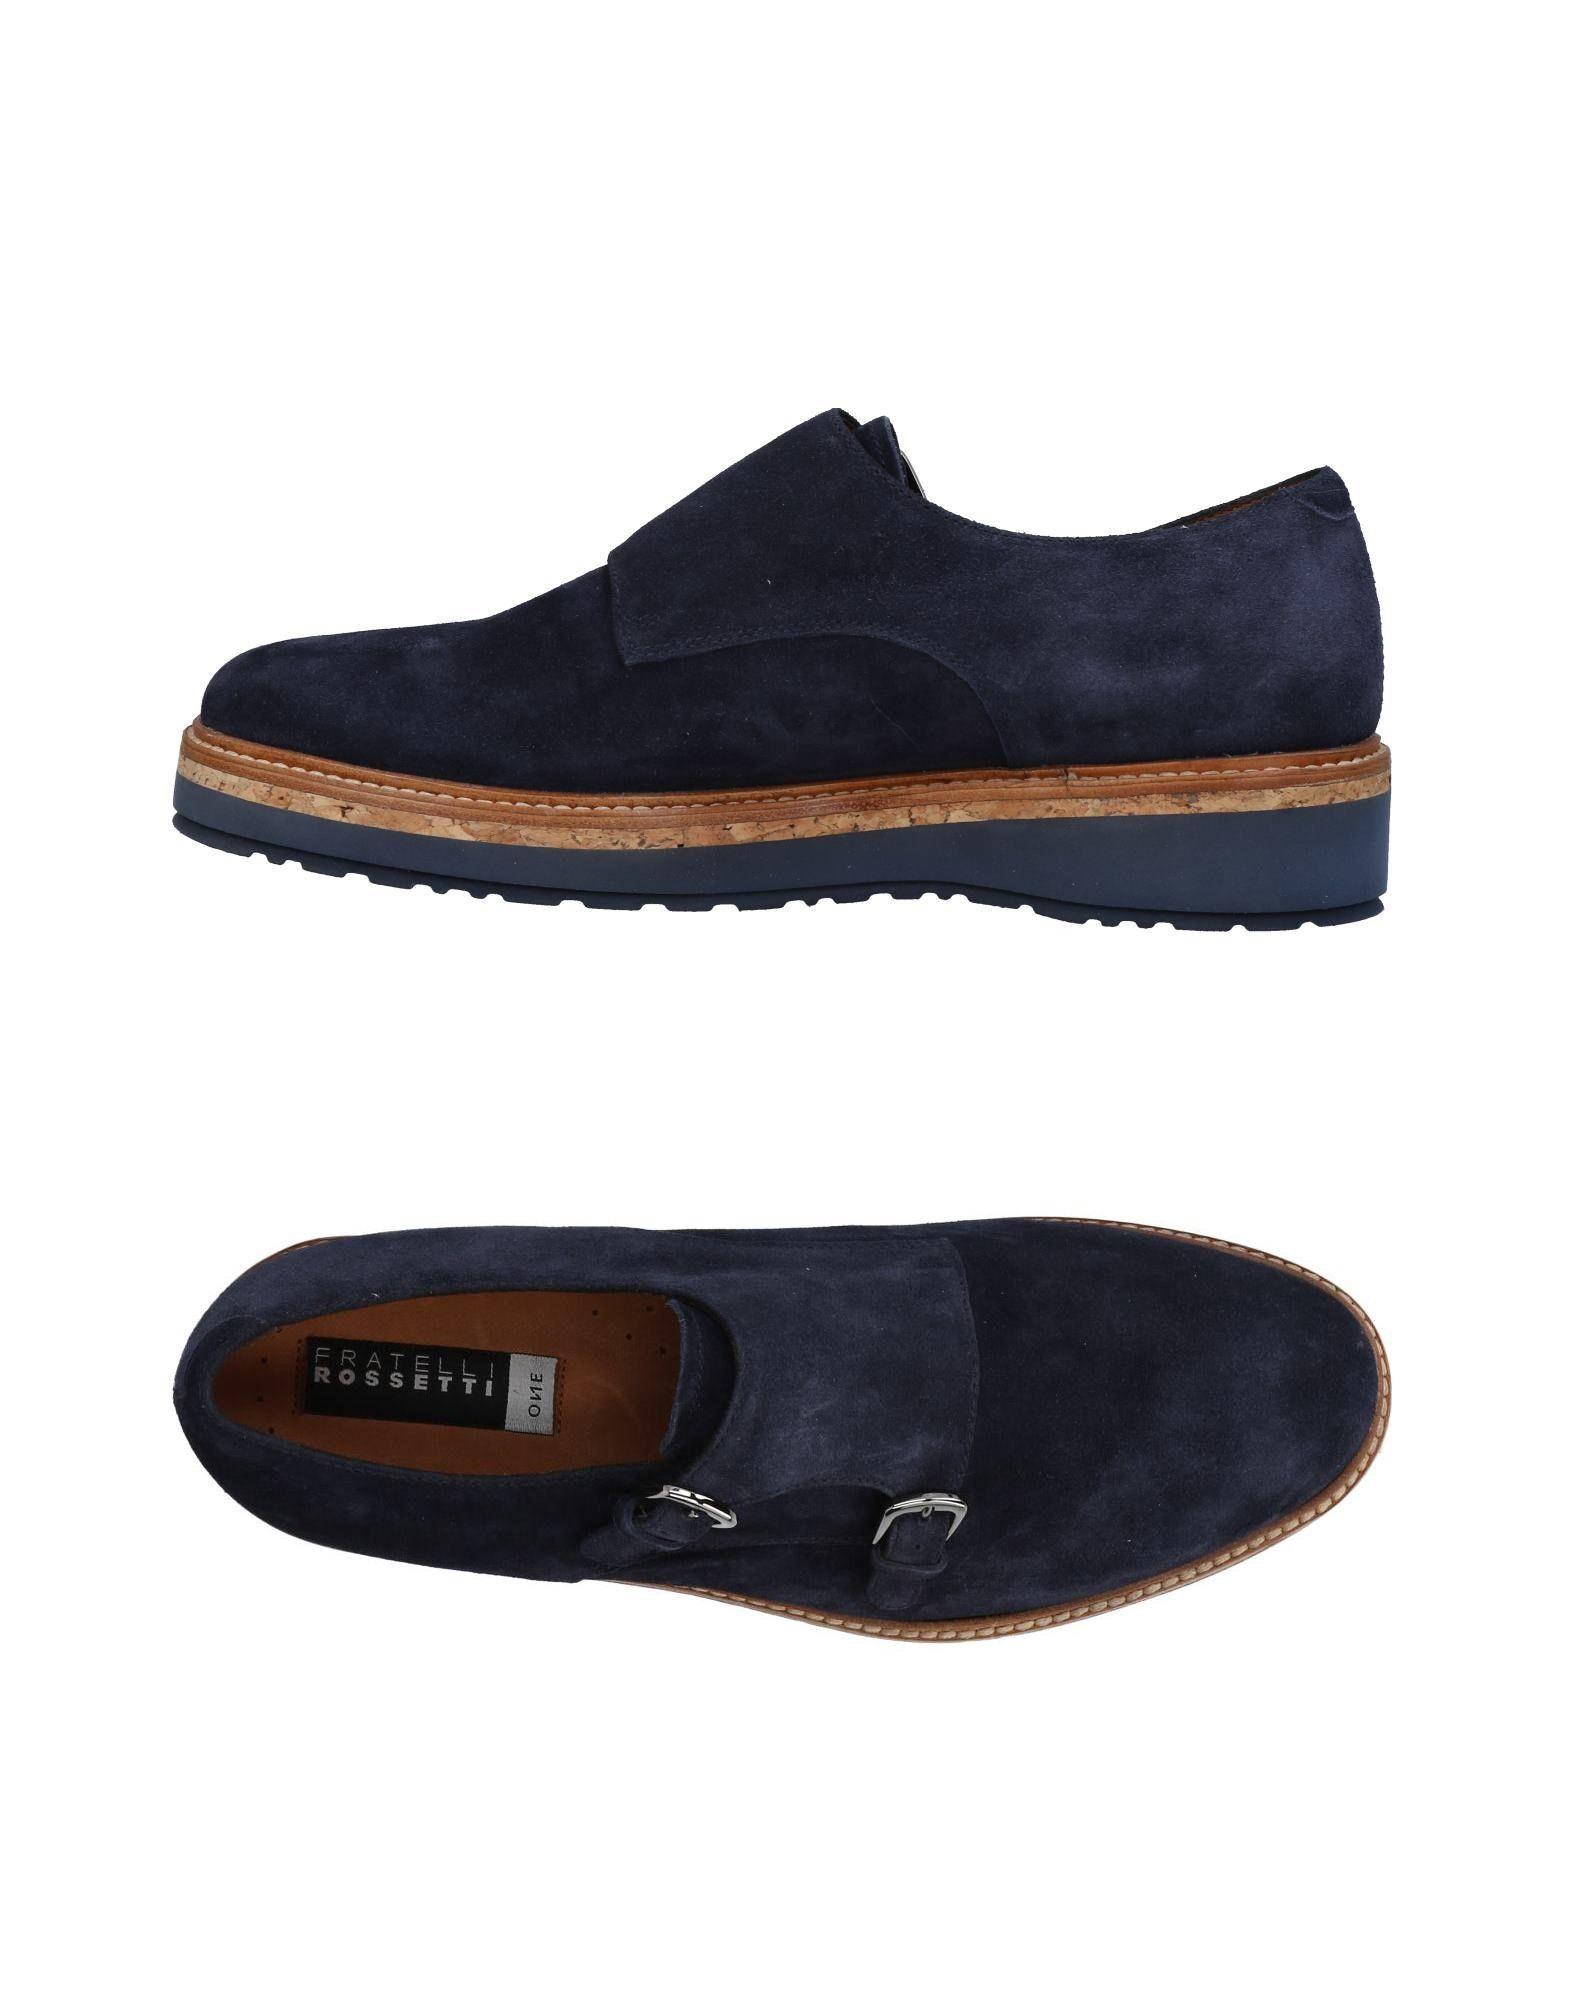 Fratelli Rossetti Mokassins Herren  11440579XQ Gute Qualität beliebte Schuhe